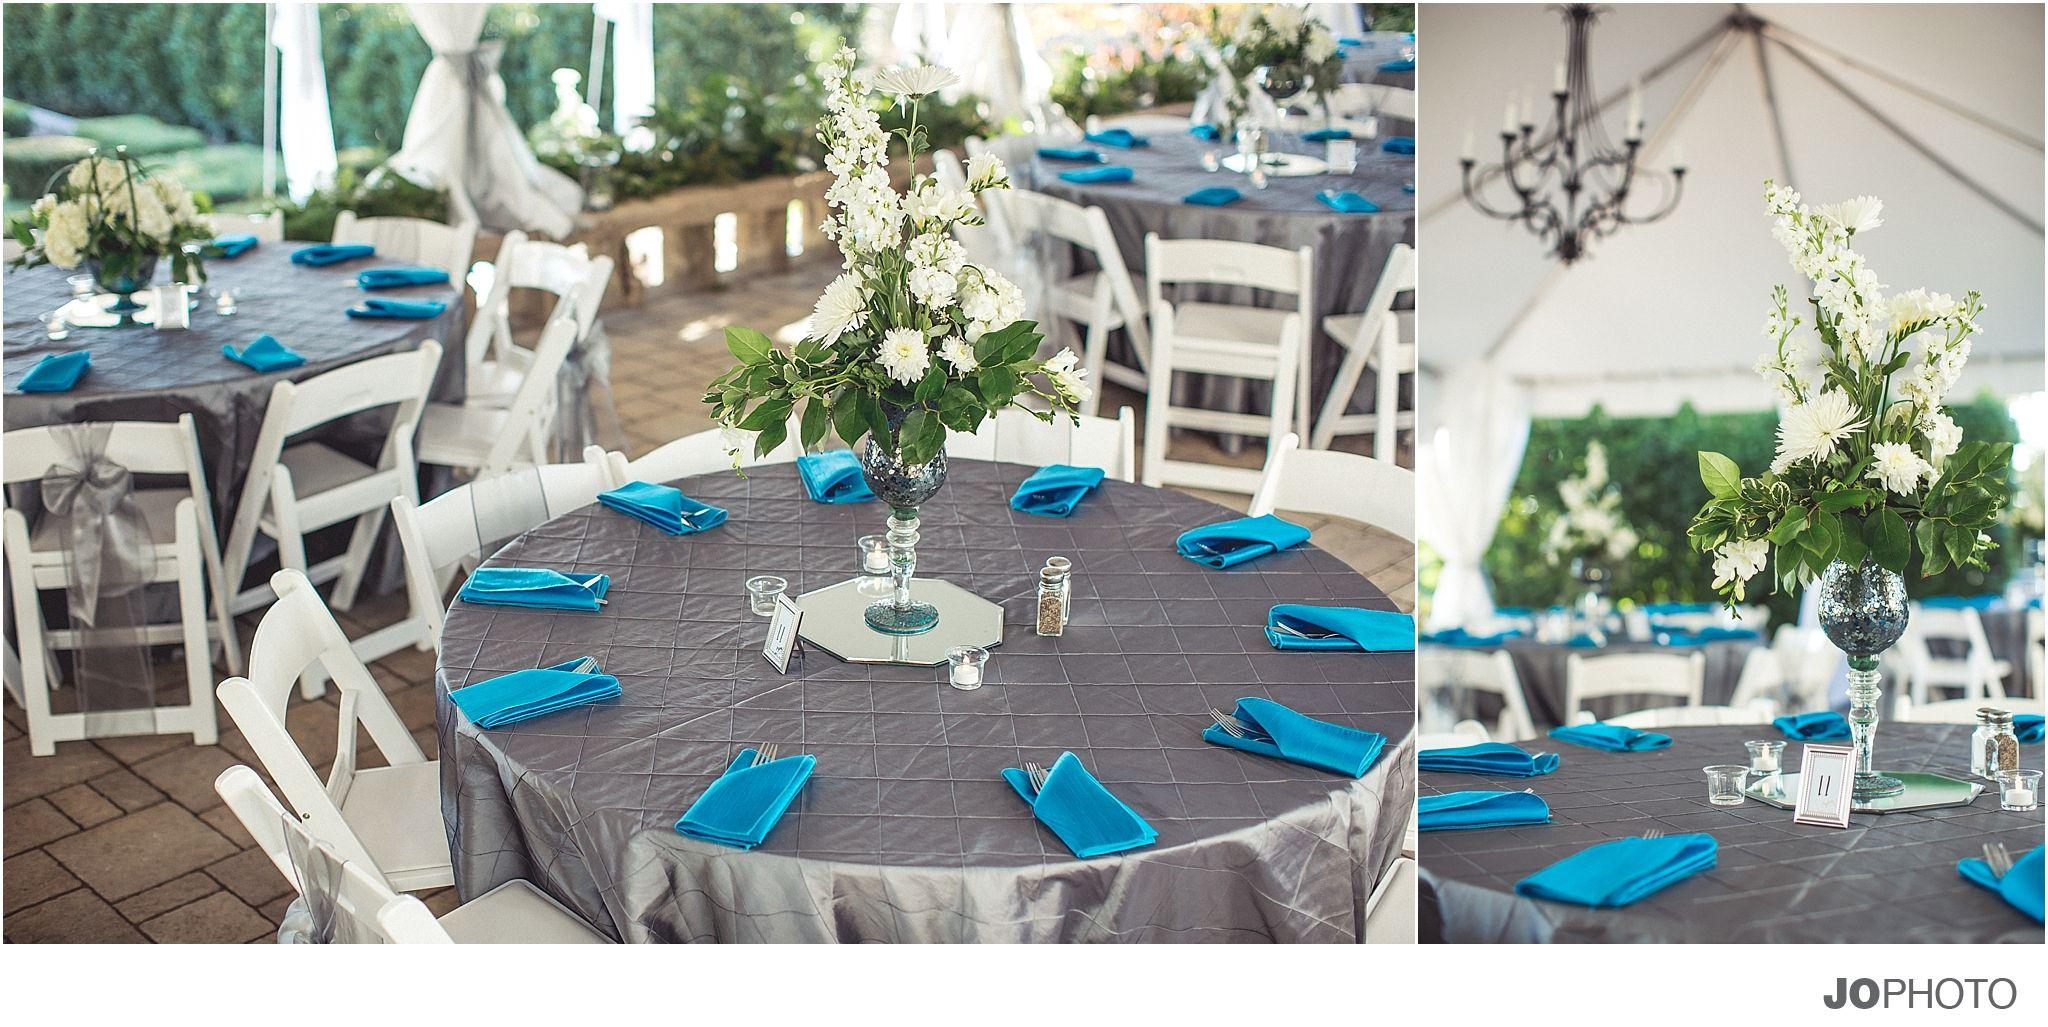 Teal-gray-wedding-reception, Turquise, Wedding, Linens